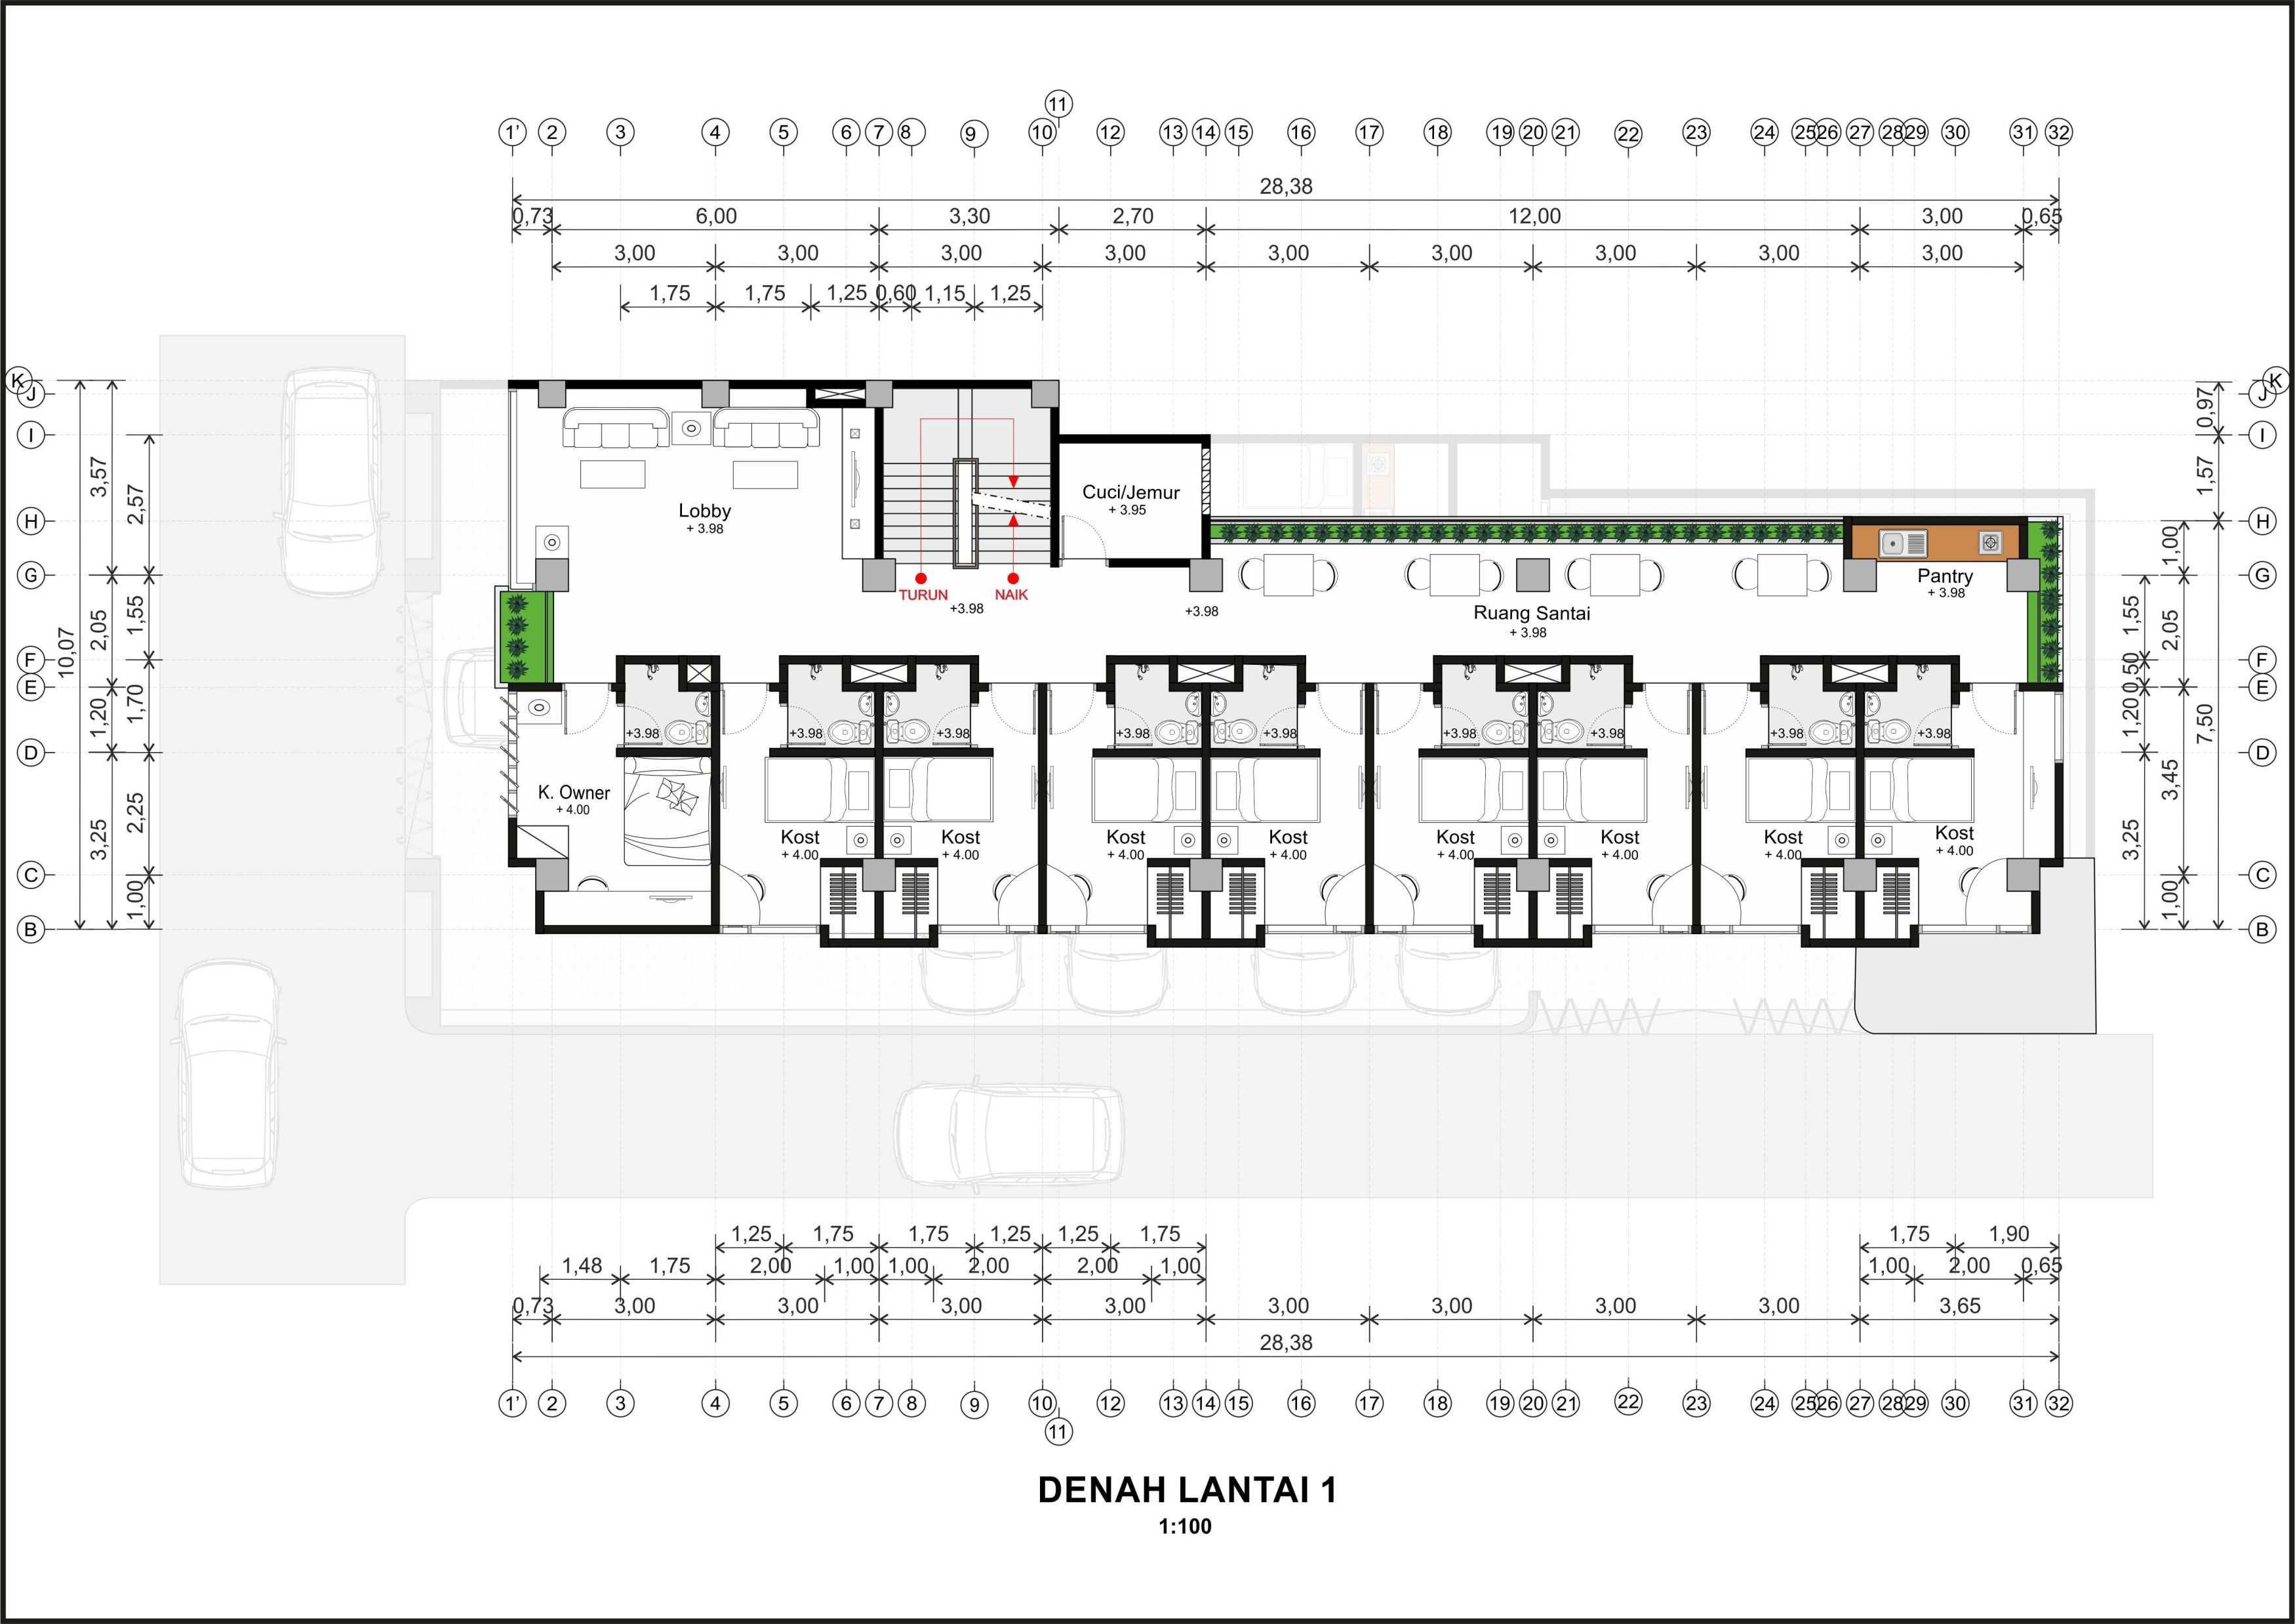 Hendra Budi Architect Wisma Sarjana Yogyakarta Yogyakarta Denah-Lantai-1   16374